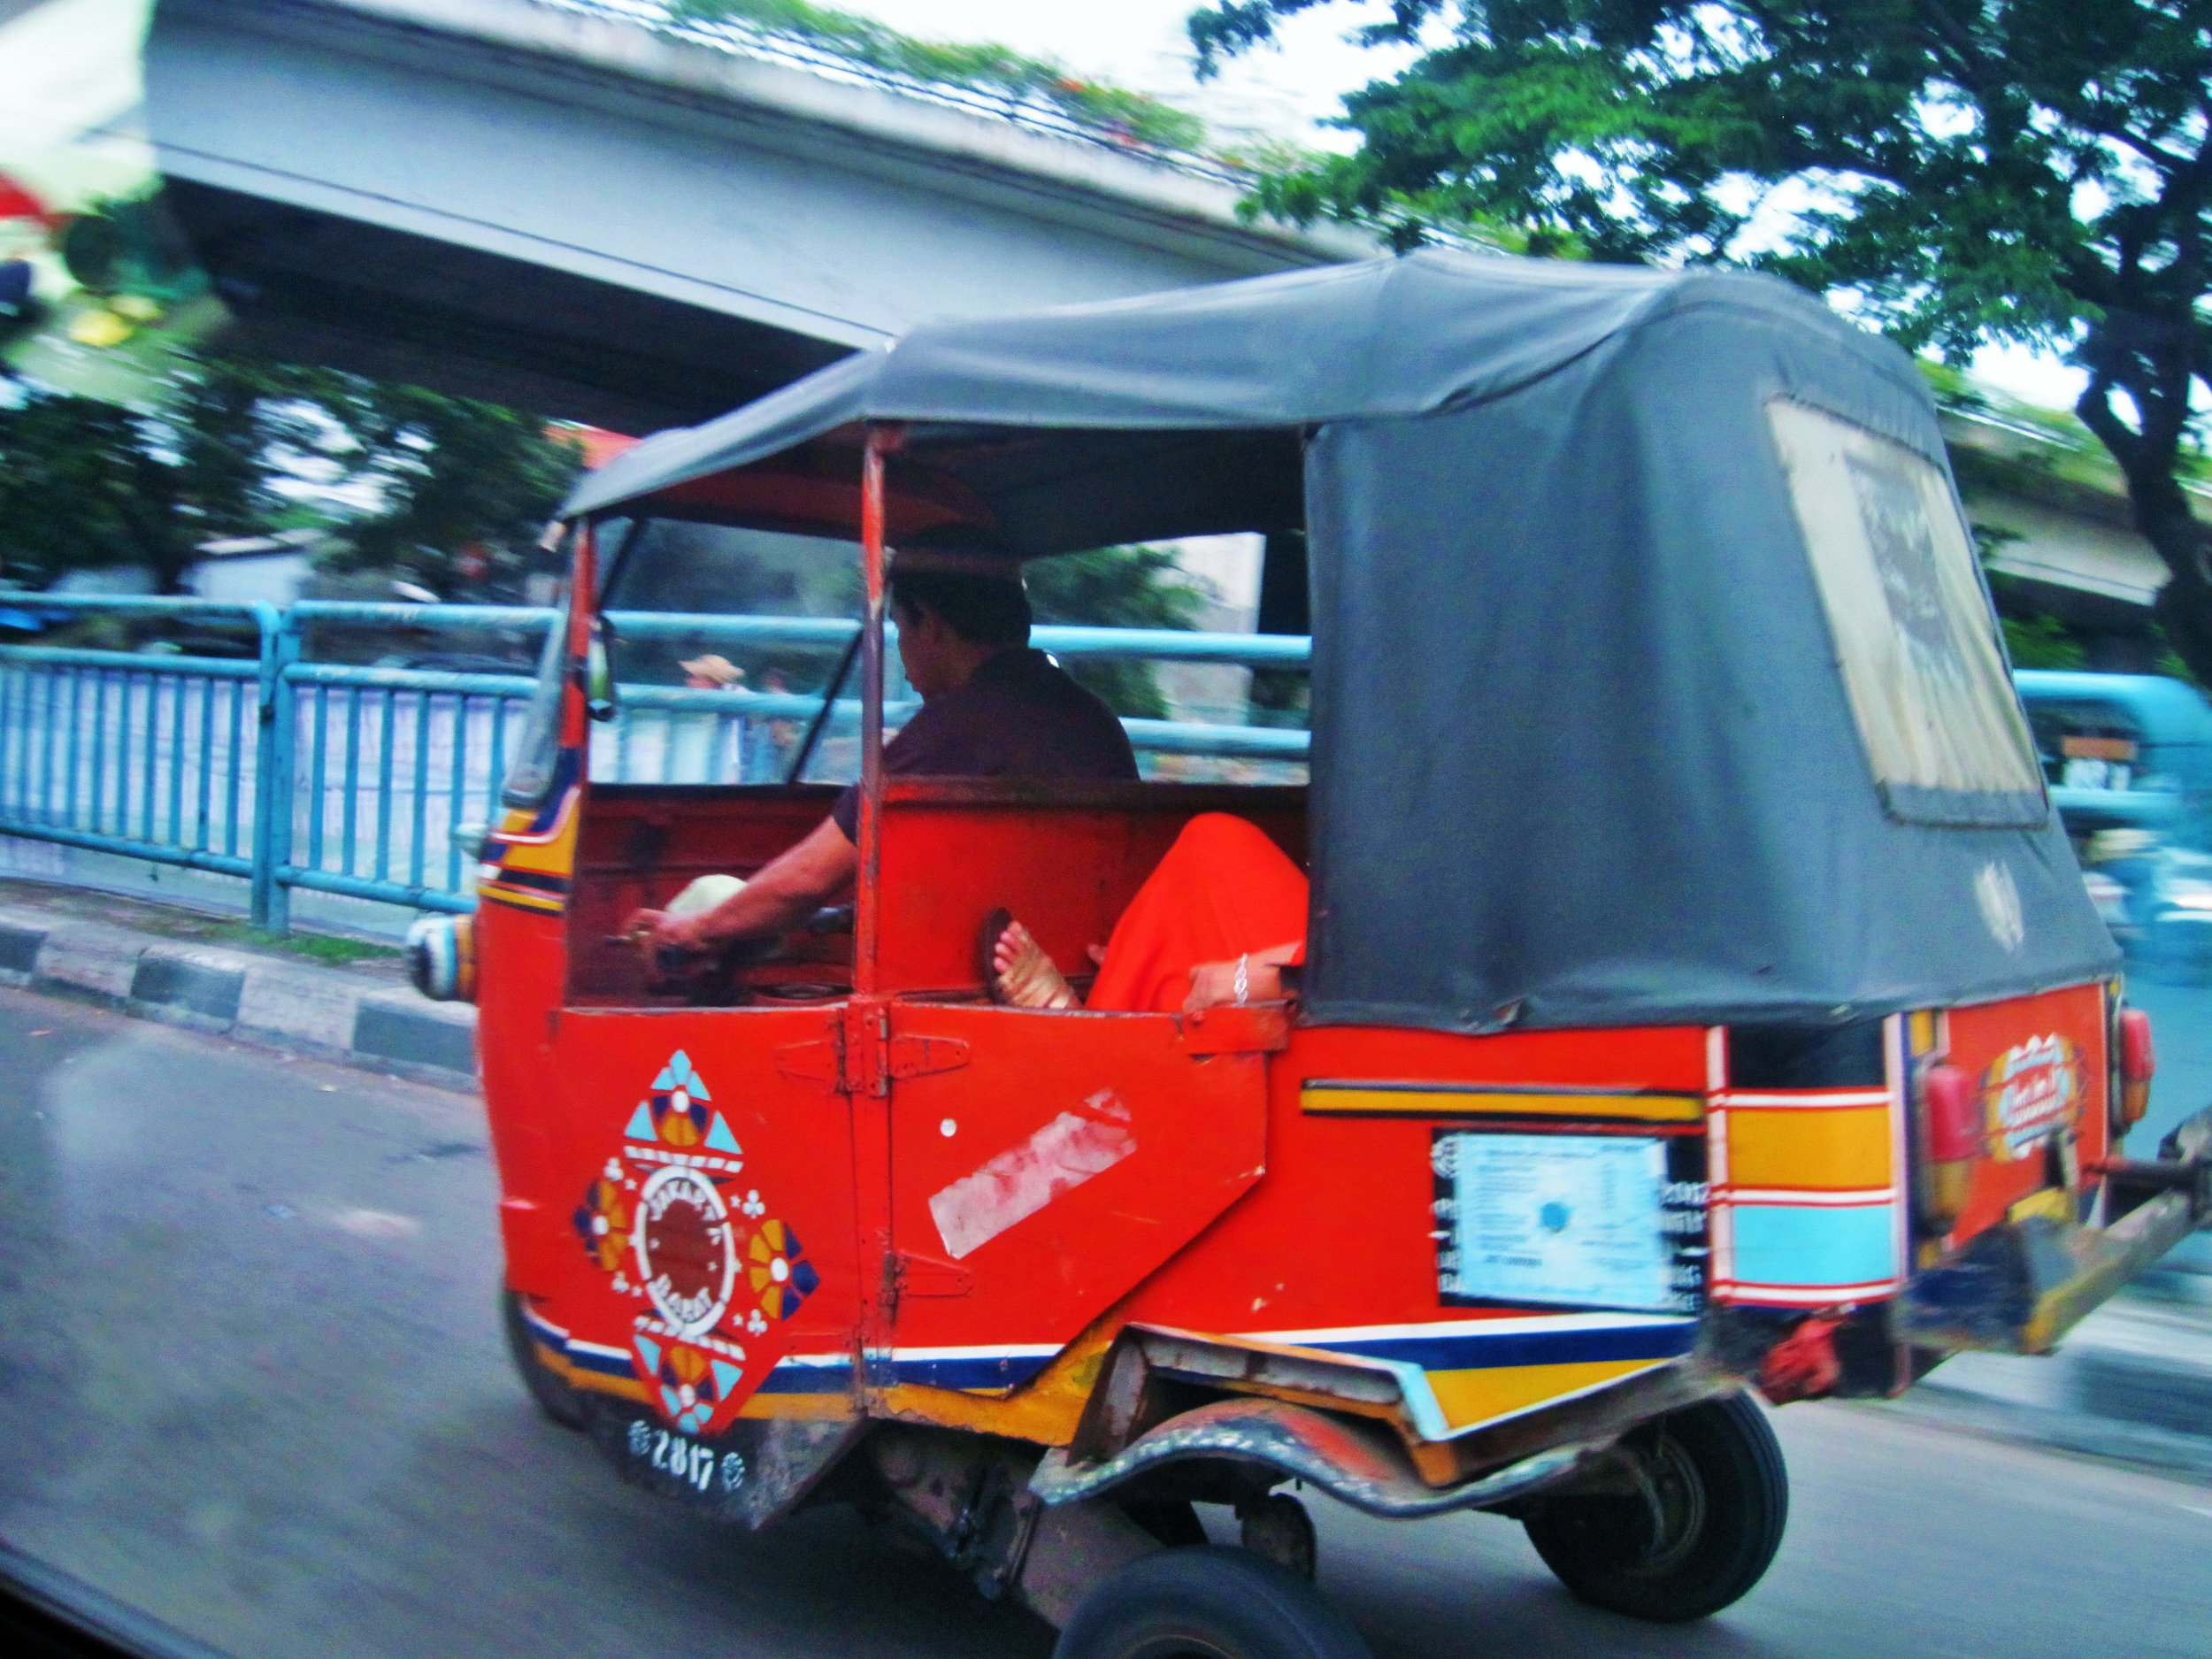 Rickshaw in Jakarta, Indonesia